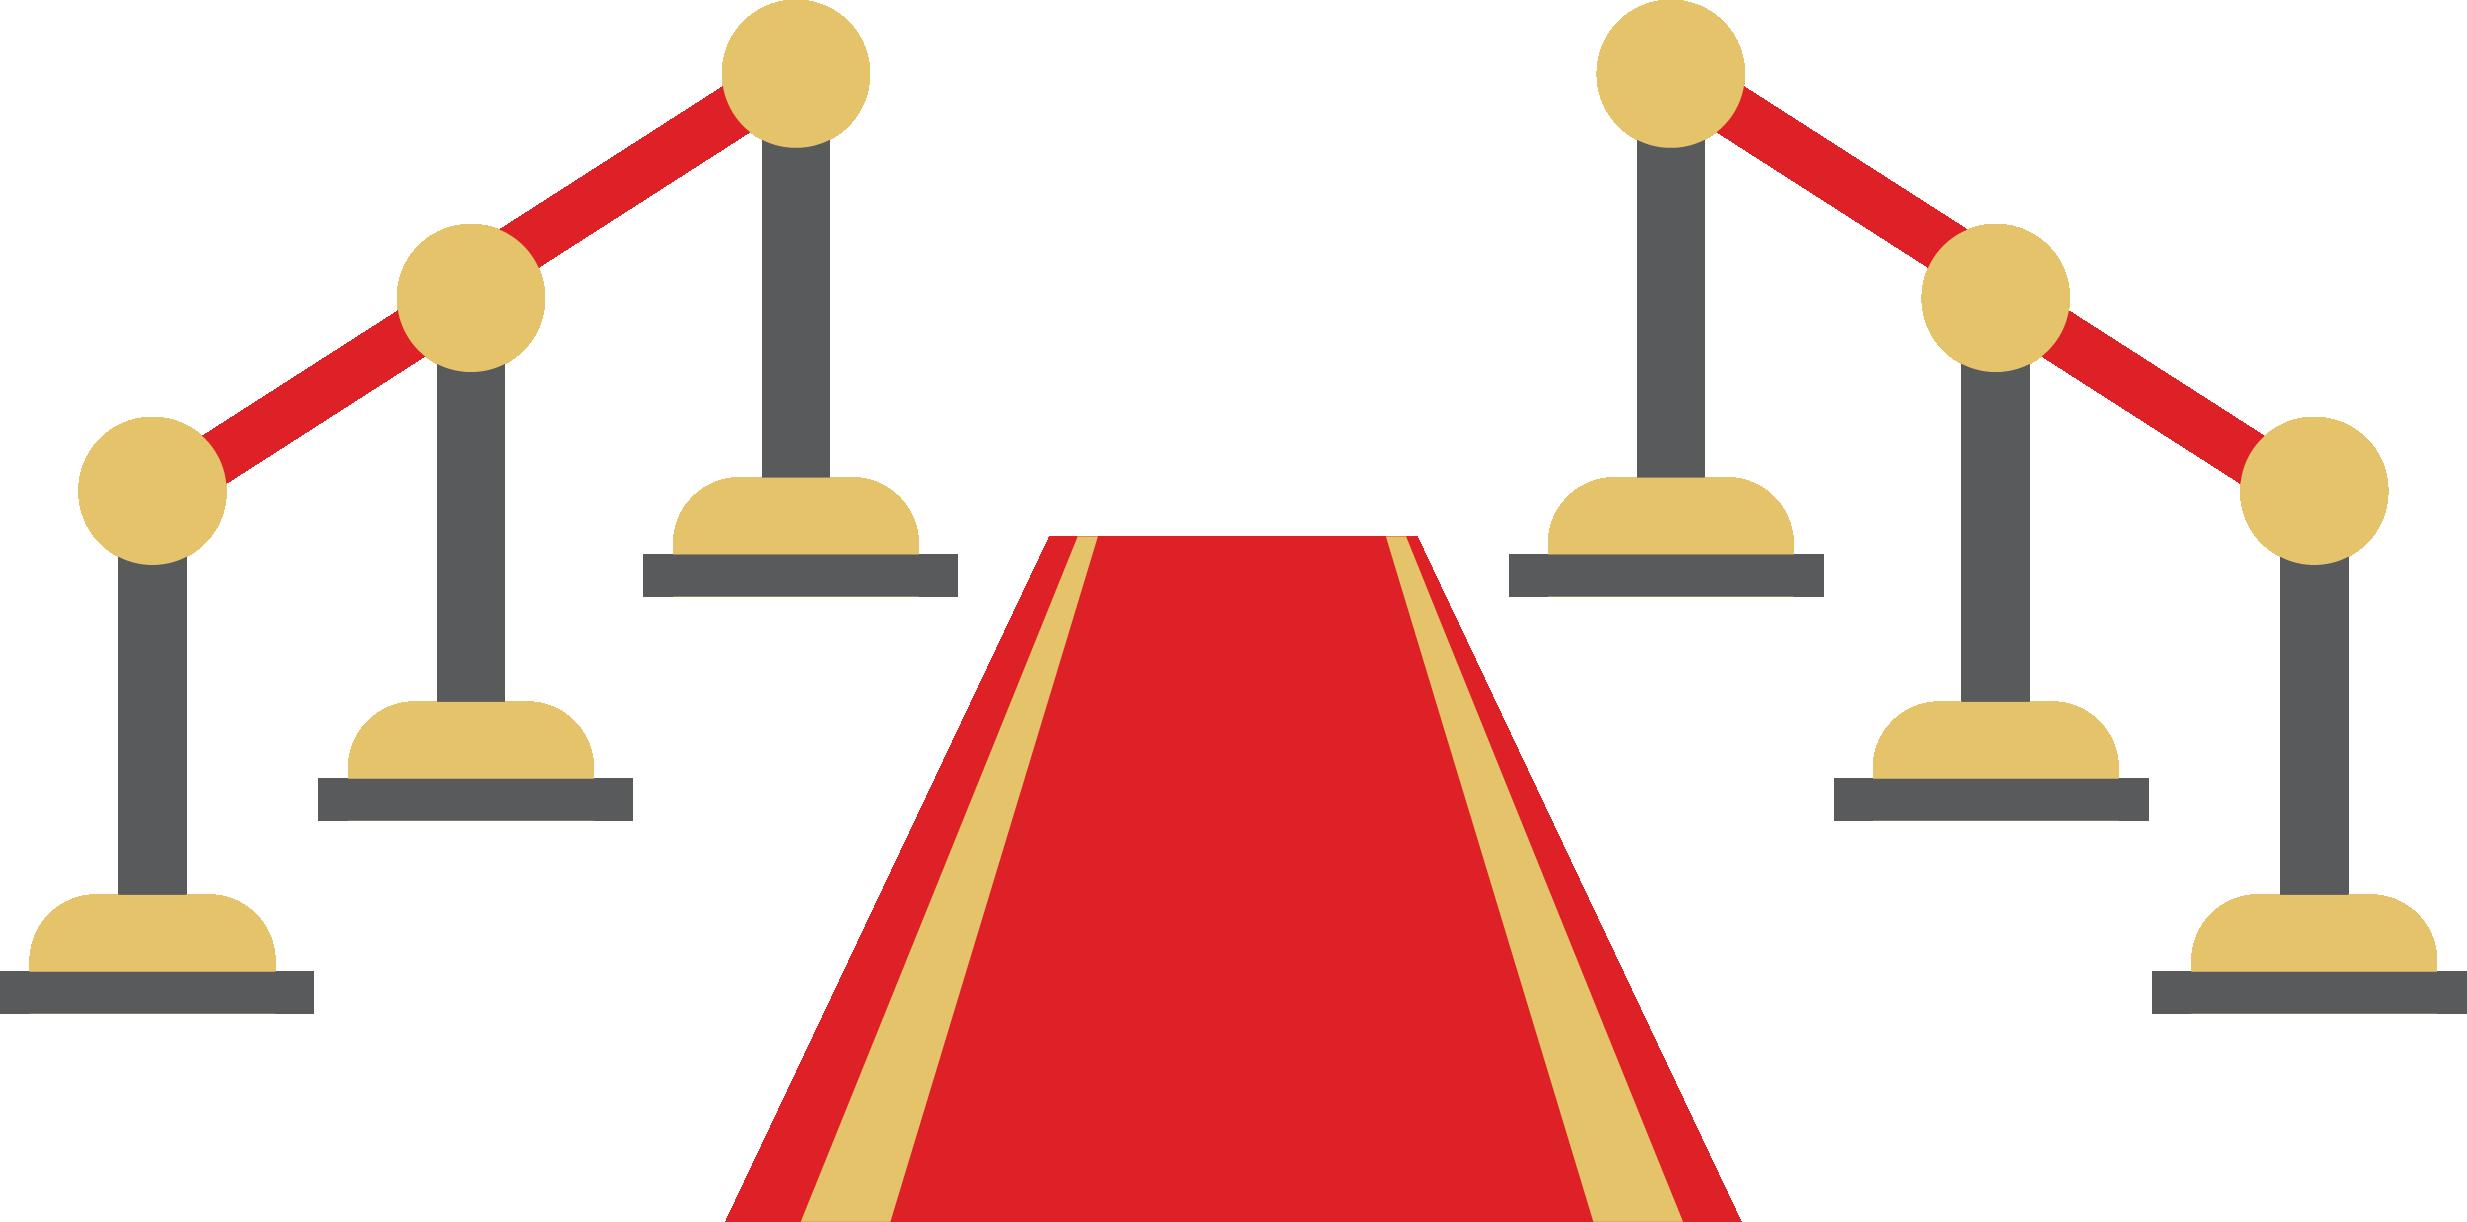 Curtain red carpet